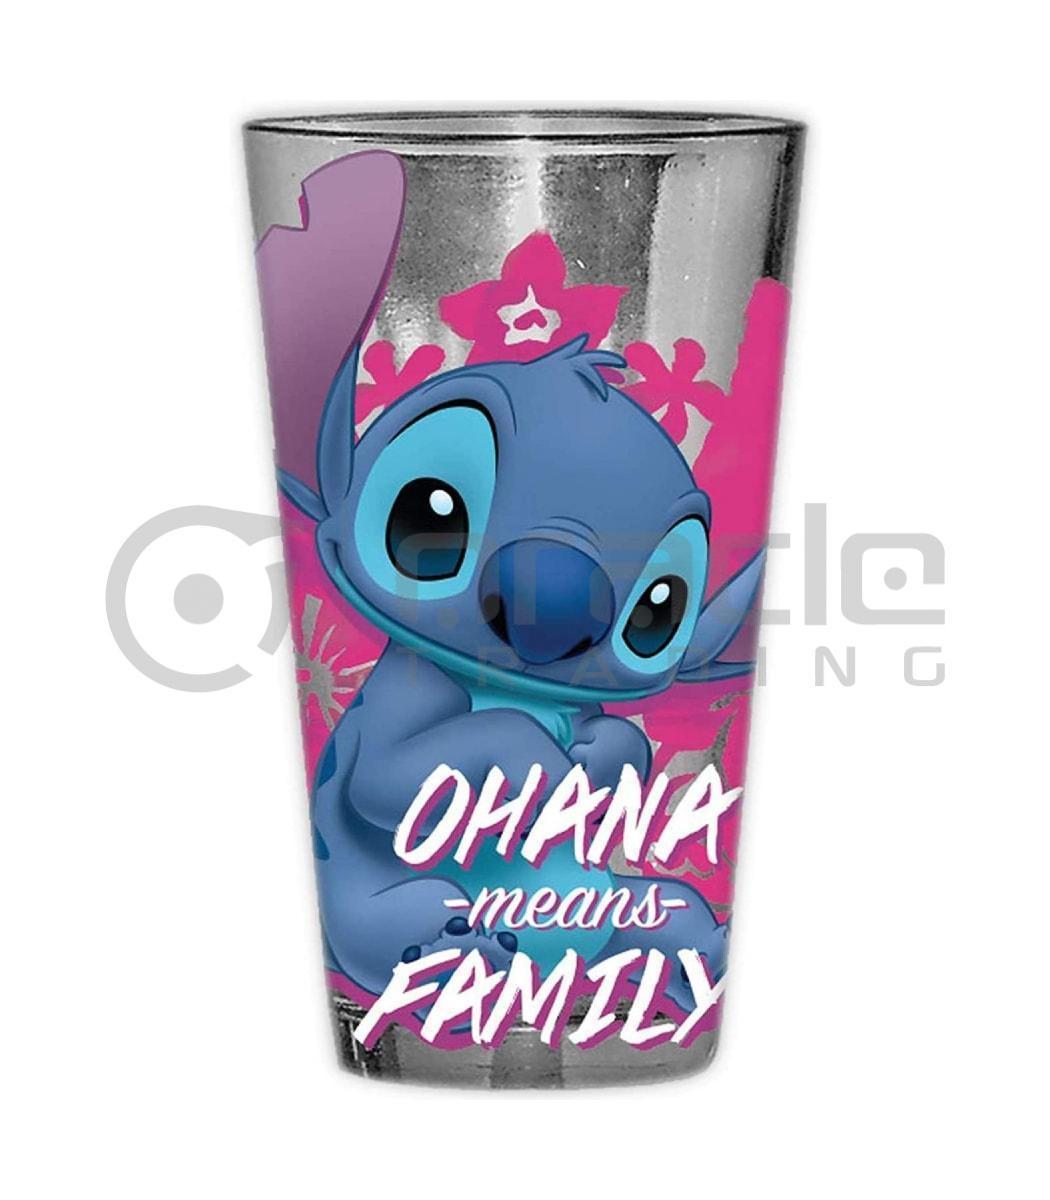 Lilo & Stitch Large Glass - Ohana Means Family